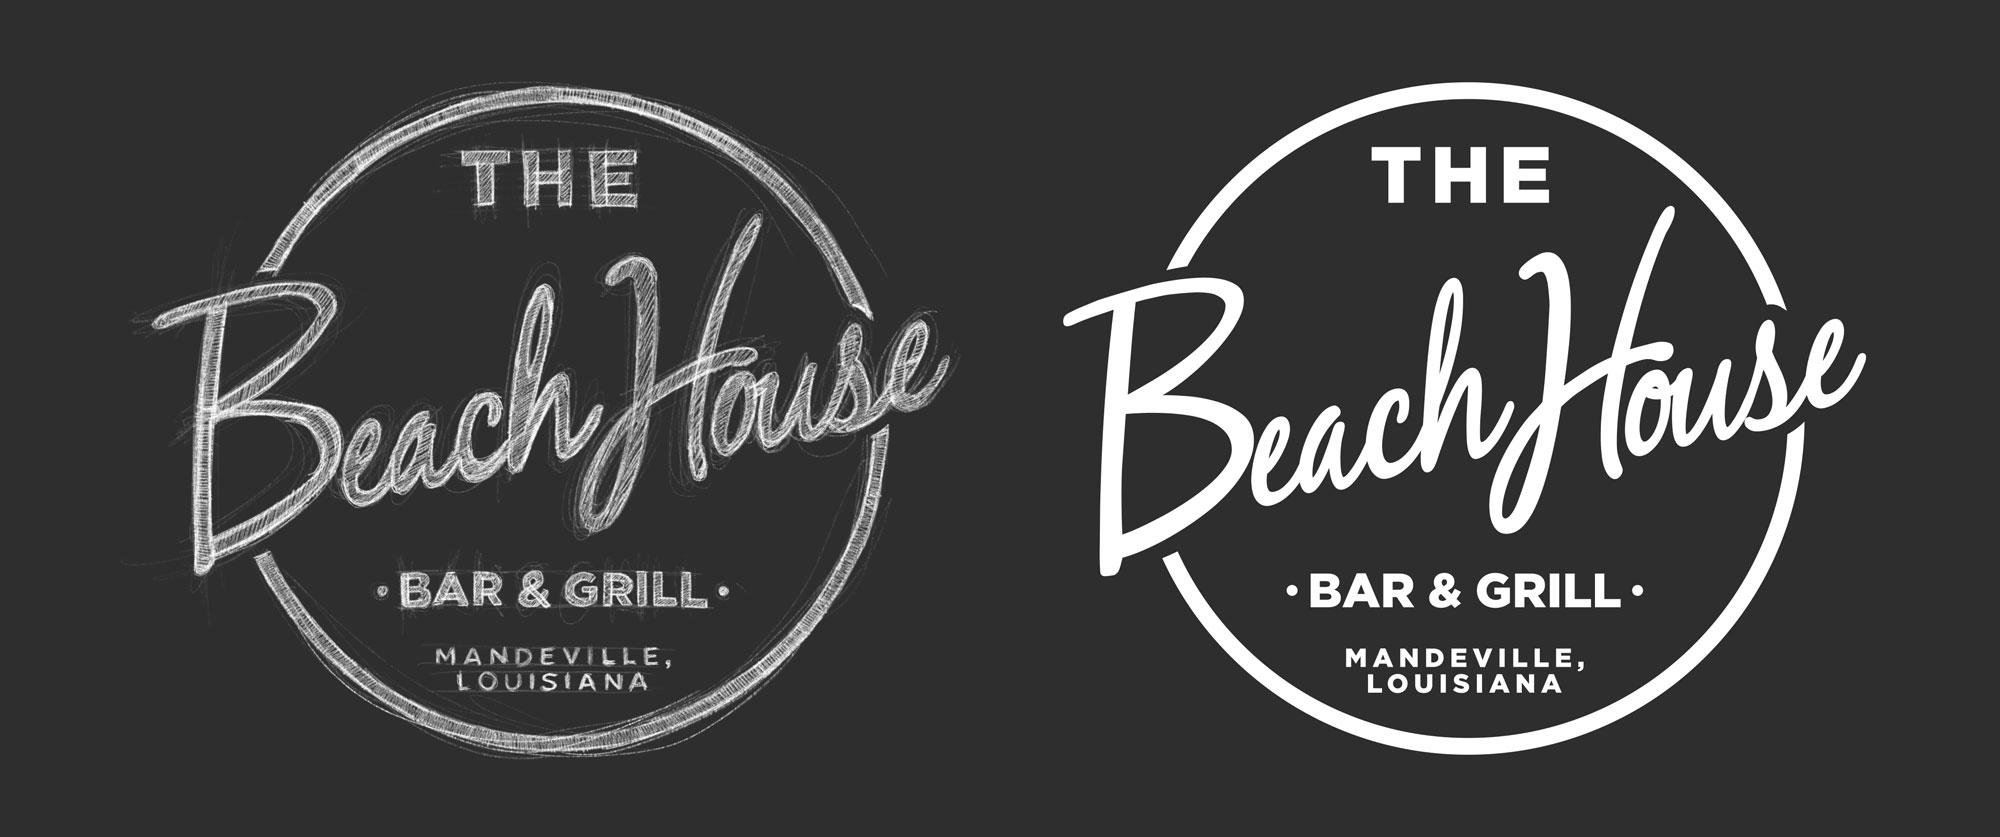 Logo Design Mockups for the Beach House